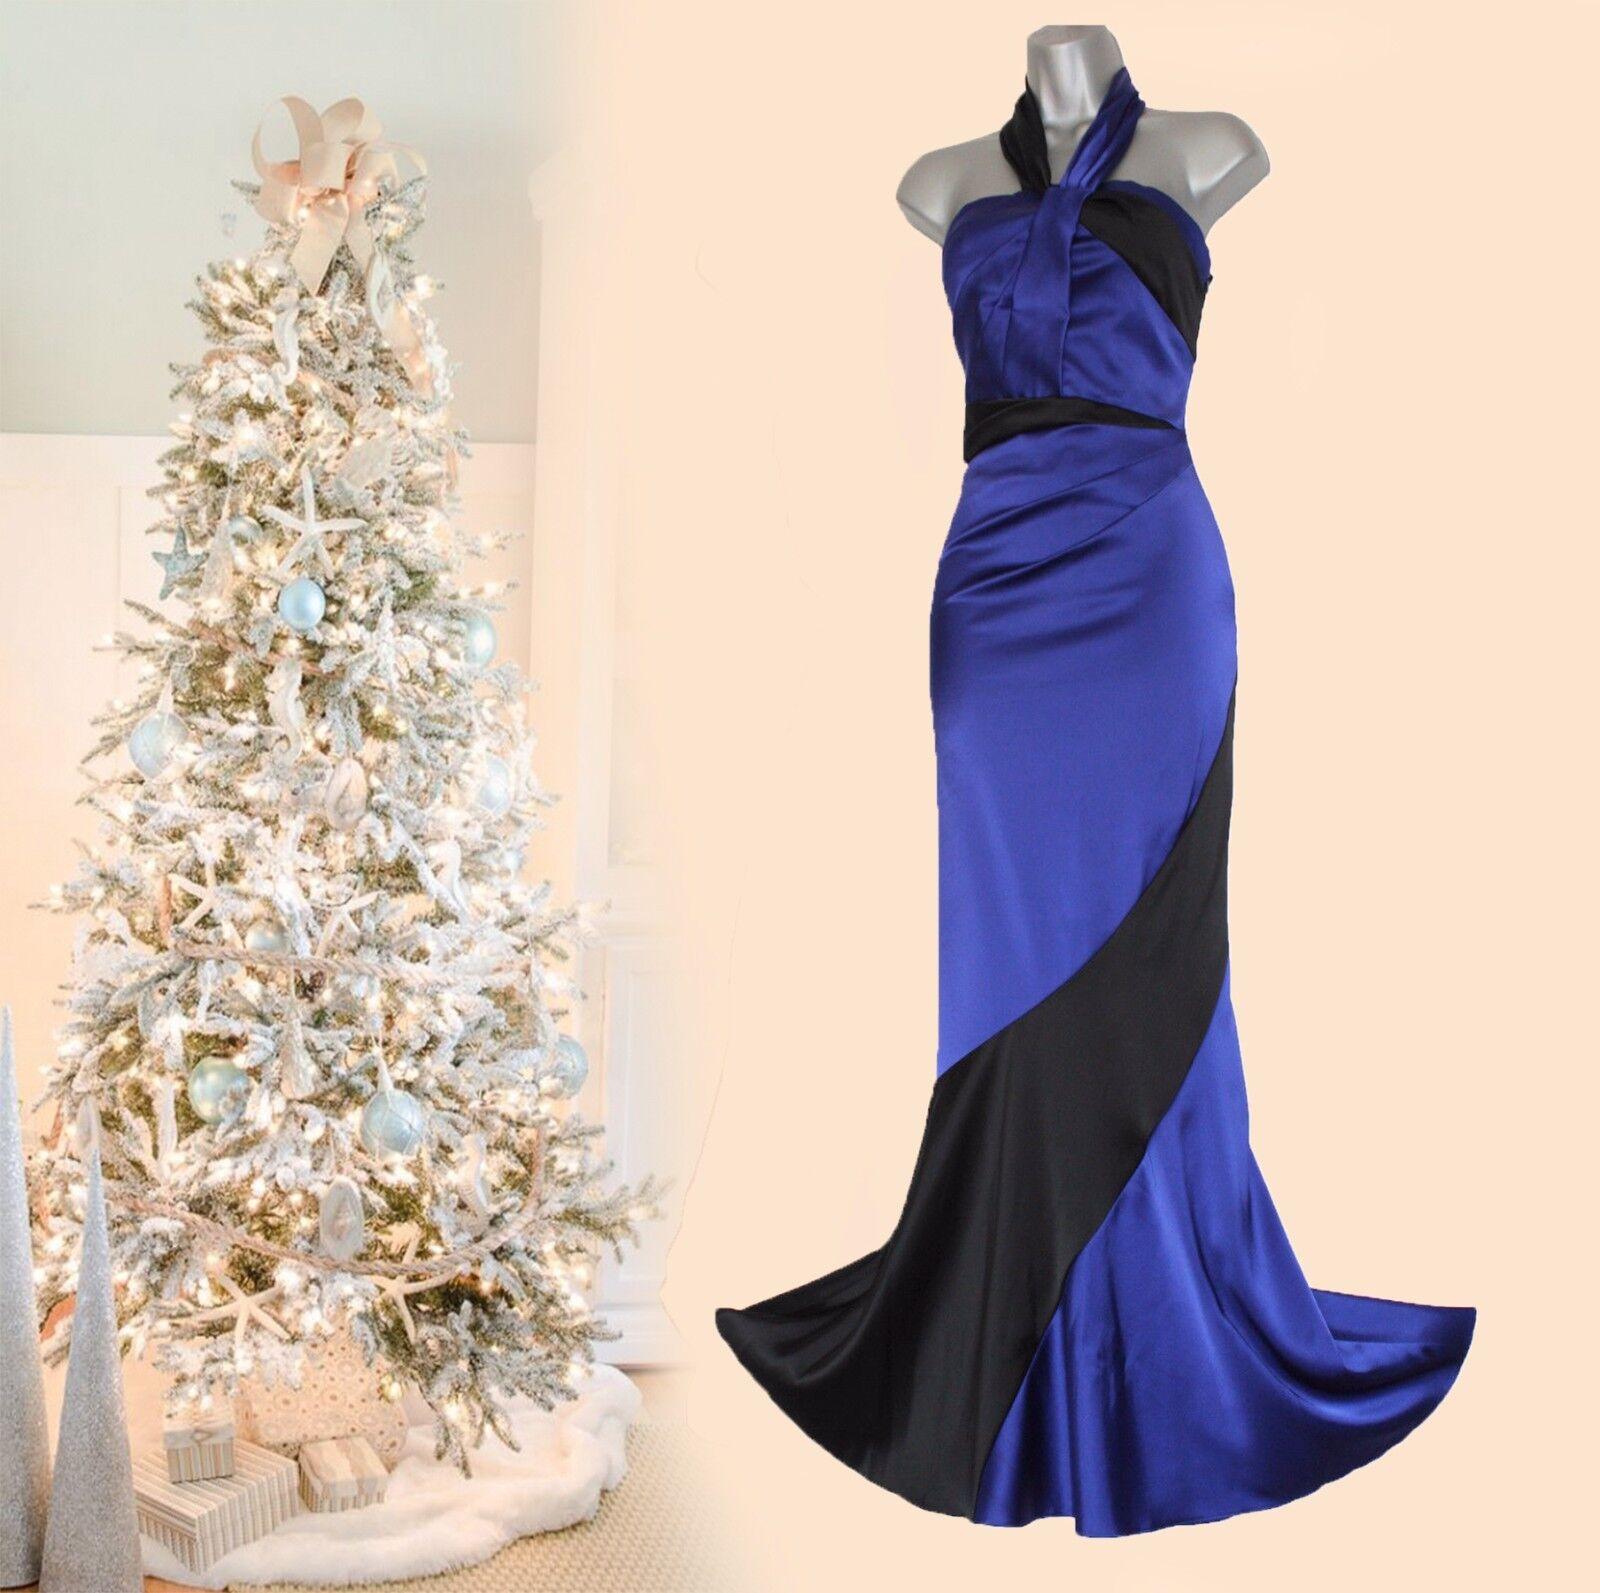 Karen Millen Blau schwarz Satin Halterneck Low Low Low Open Back Fishtail Maxi Dress 10 38 4cd66a